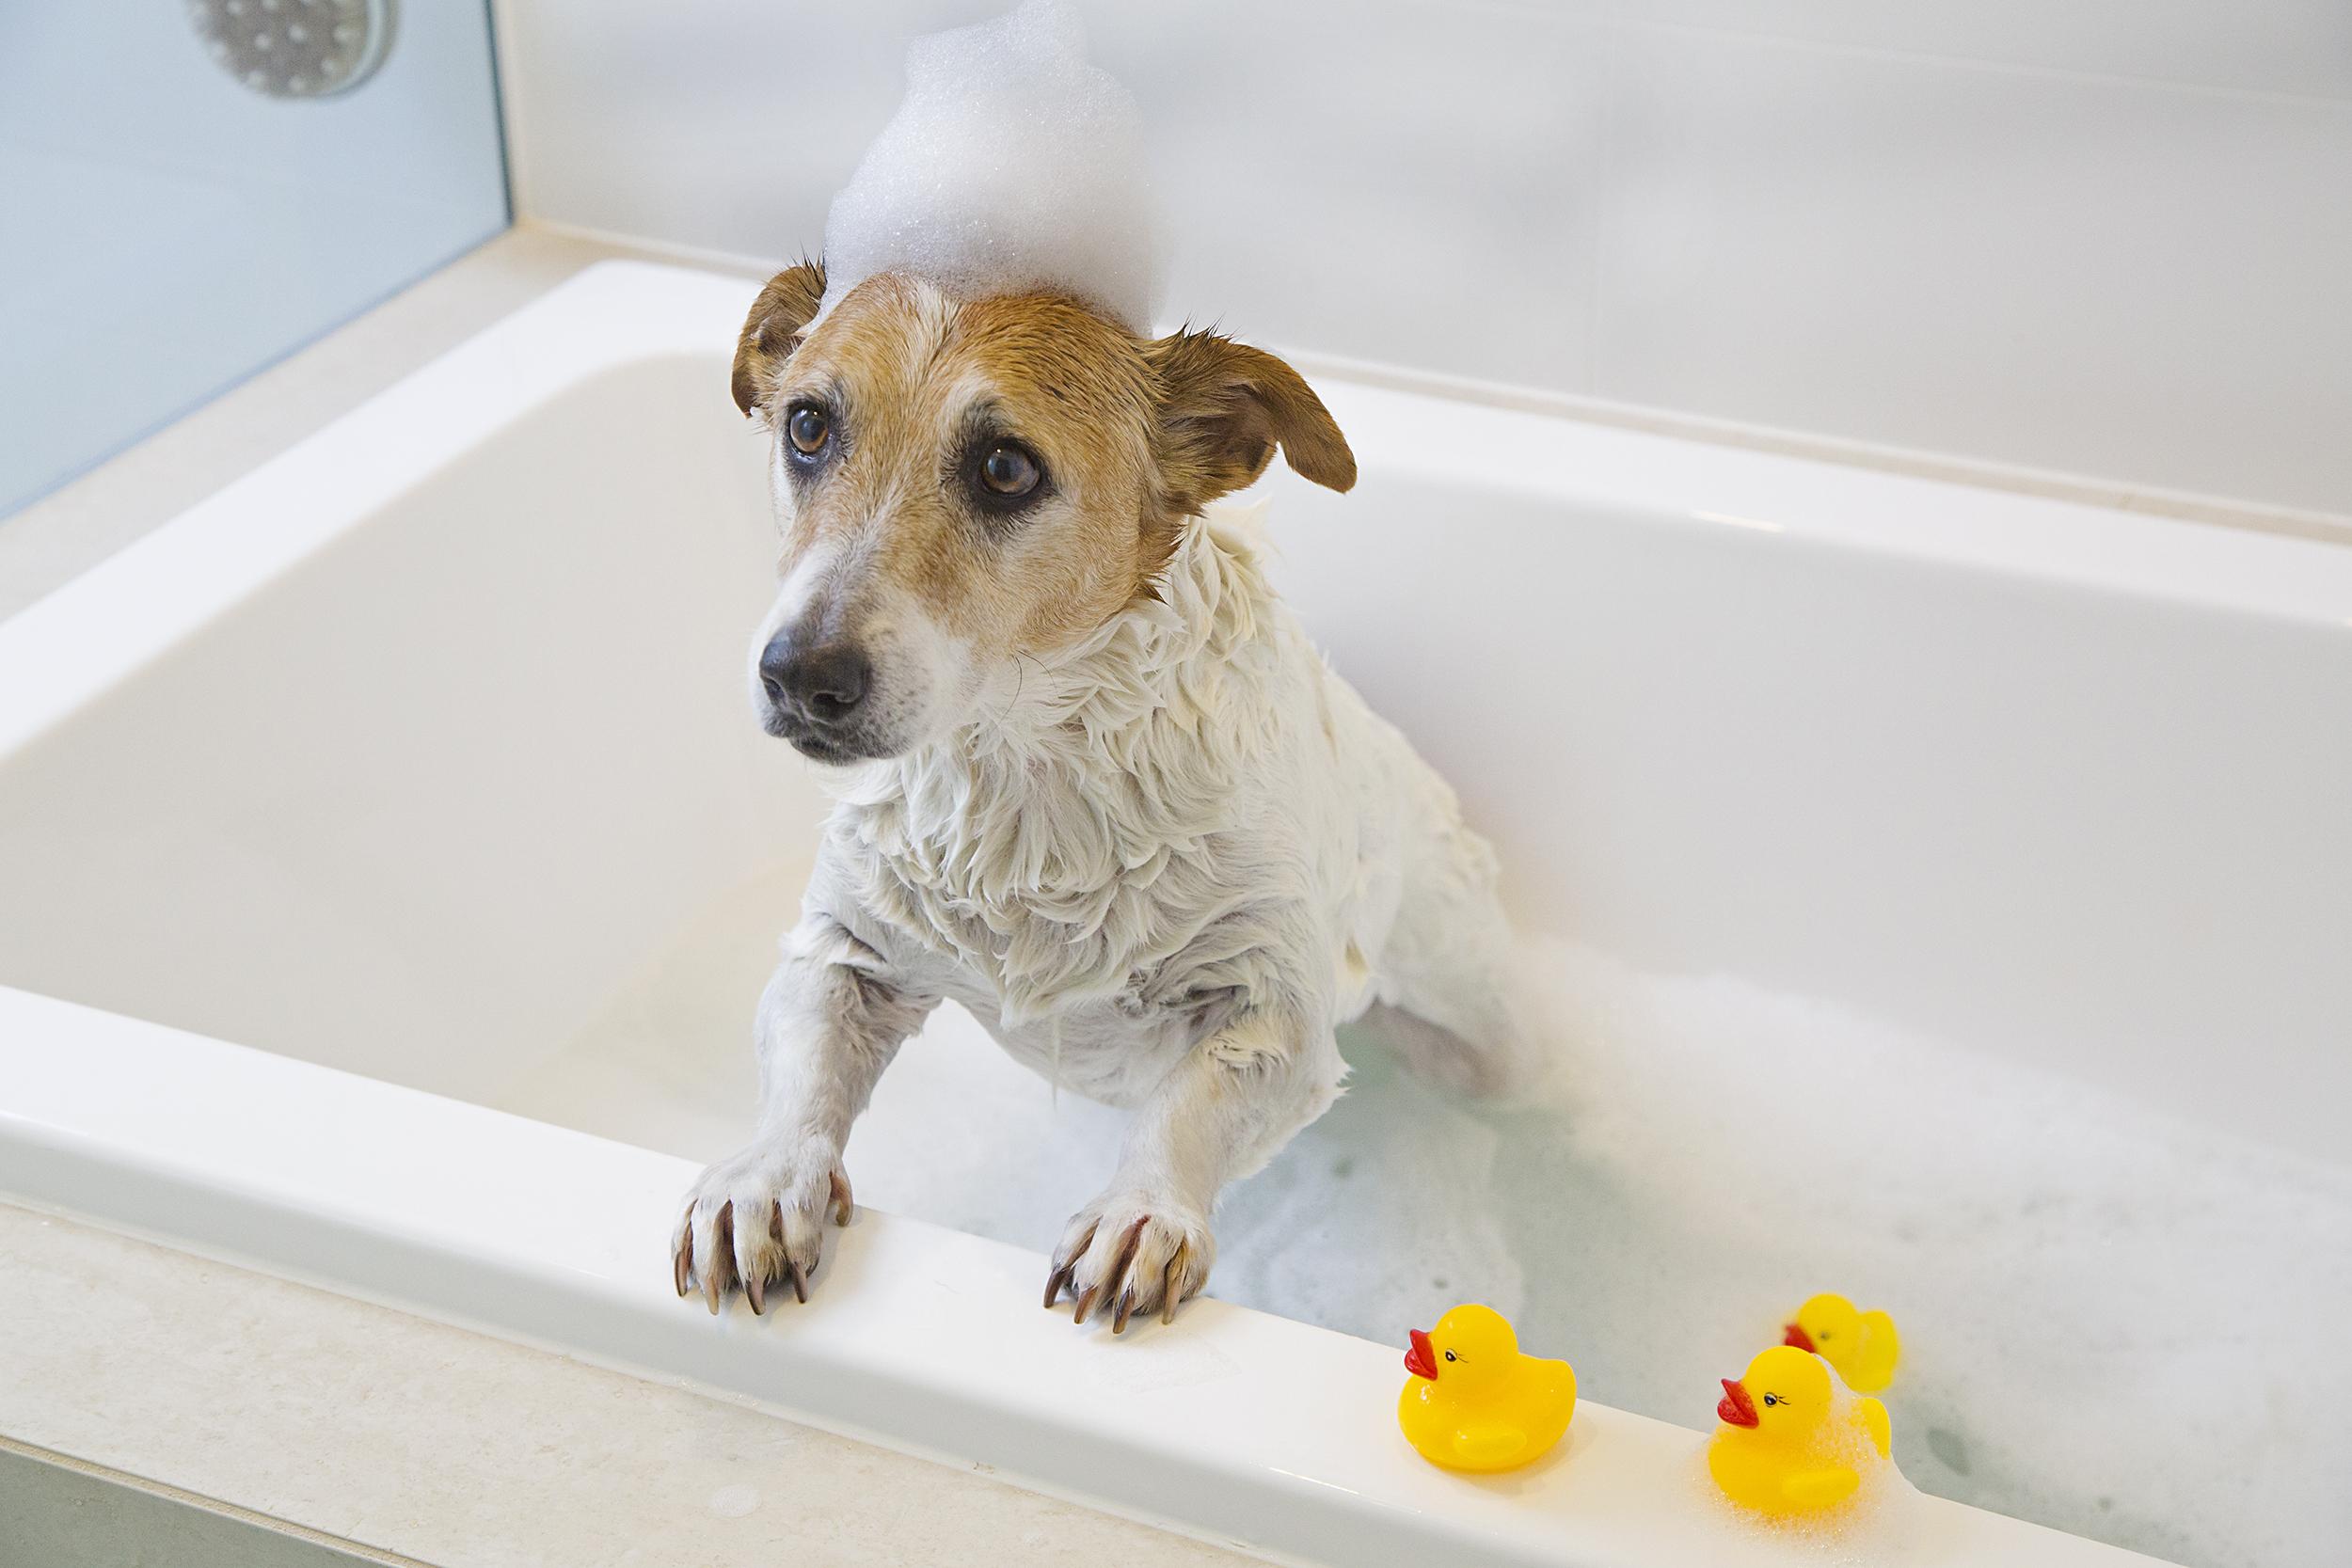 _Snoop bath 8A1353 (1).jpg